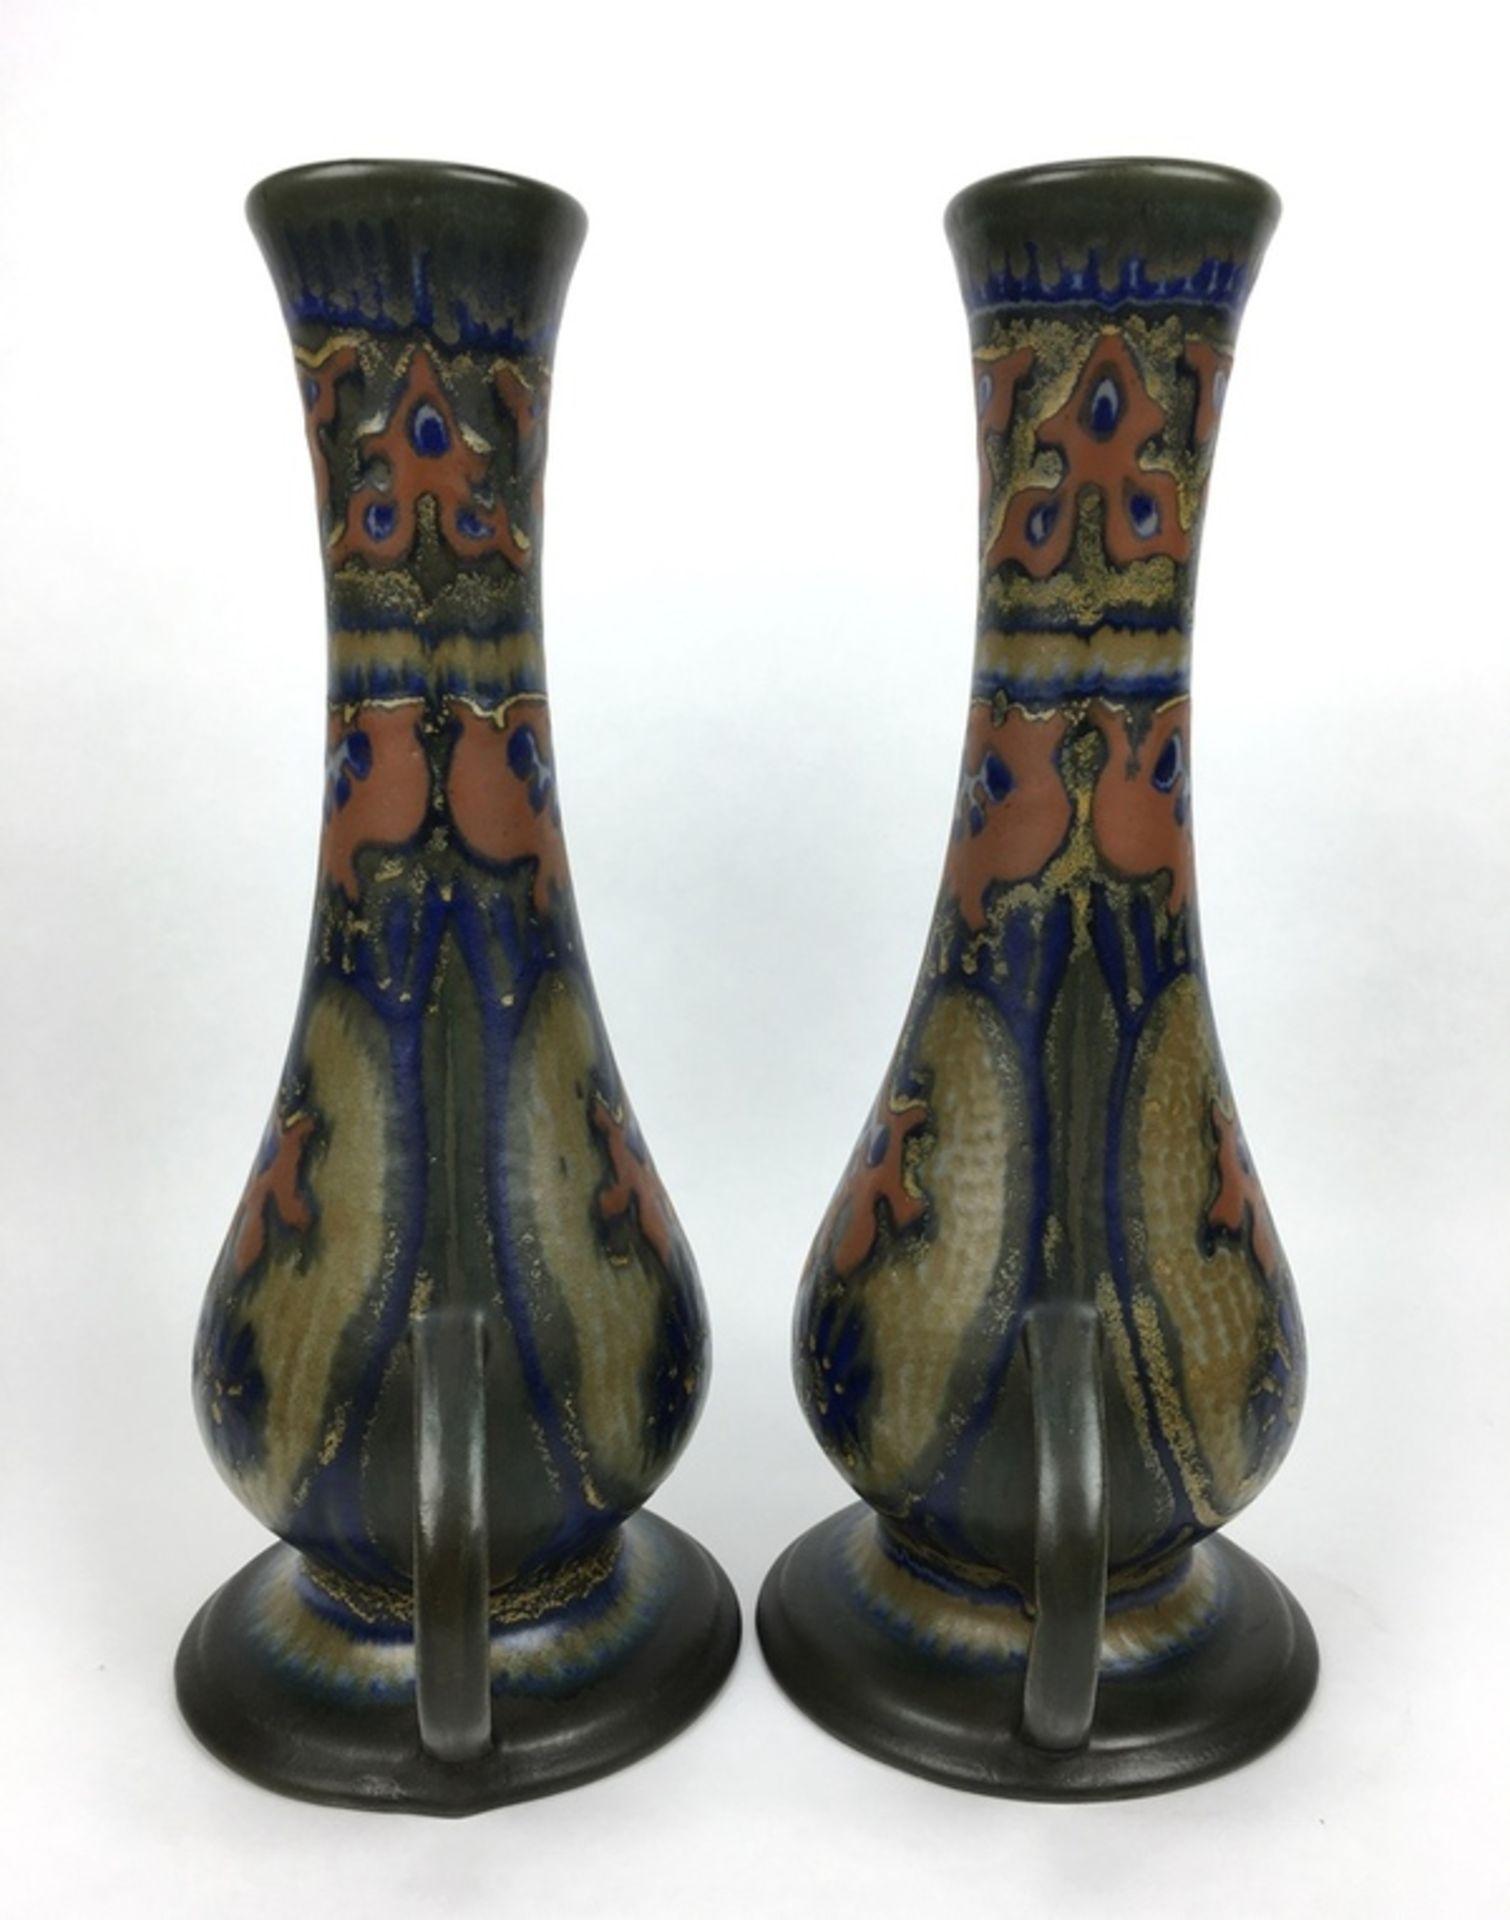 (Toegpaste kunst) Amfora vazen, Plateelbakkerij Zuid-HollandEen paar amfora vazen, Plateelbakke - Image 3 of 8